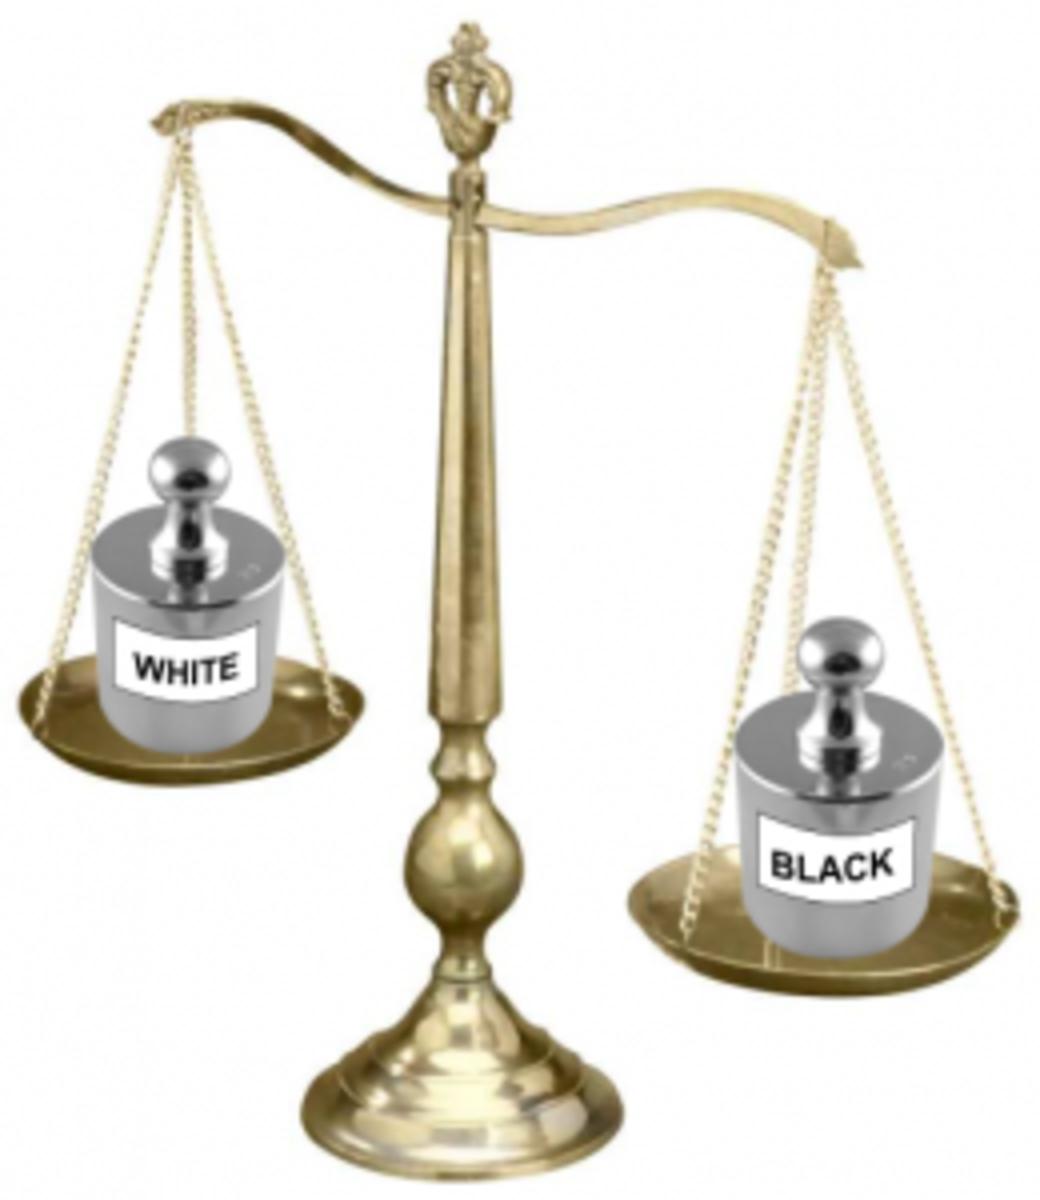 Black white imbalance